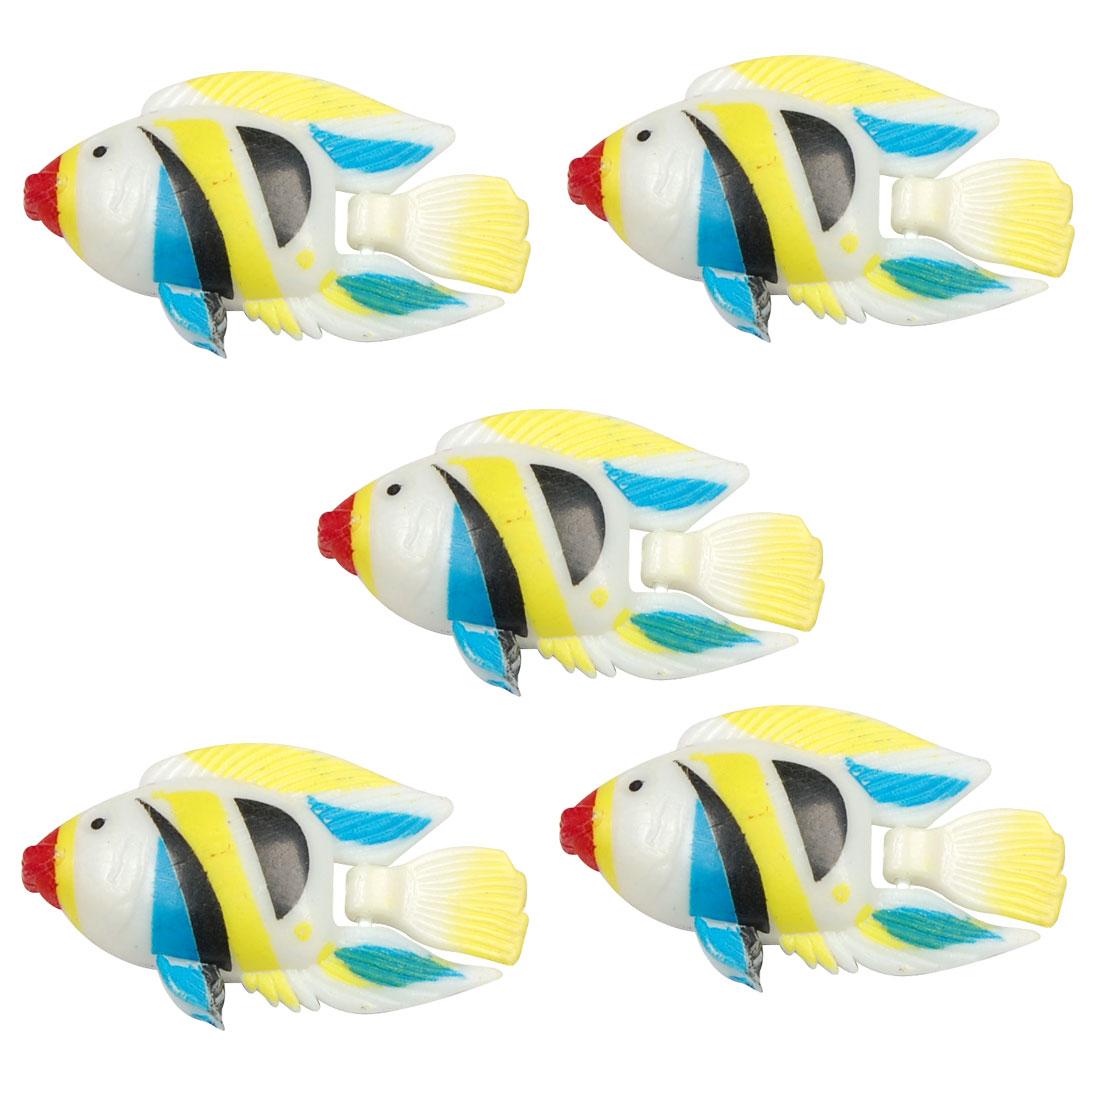 5 Pcs Aquarium Artificial Swing Tail Striped Plastic Fishes Yellow Blue Black